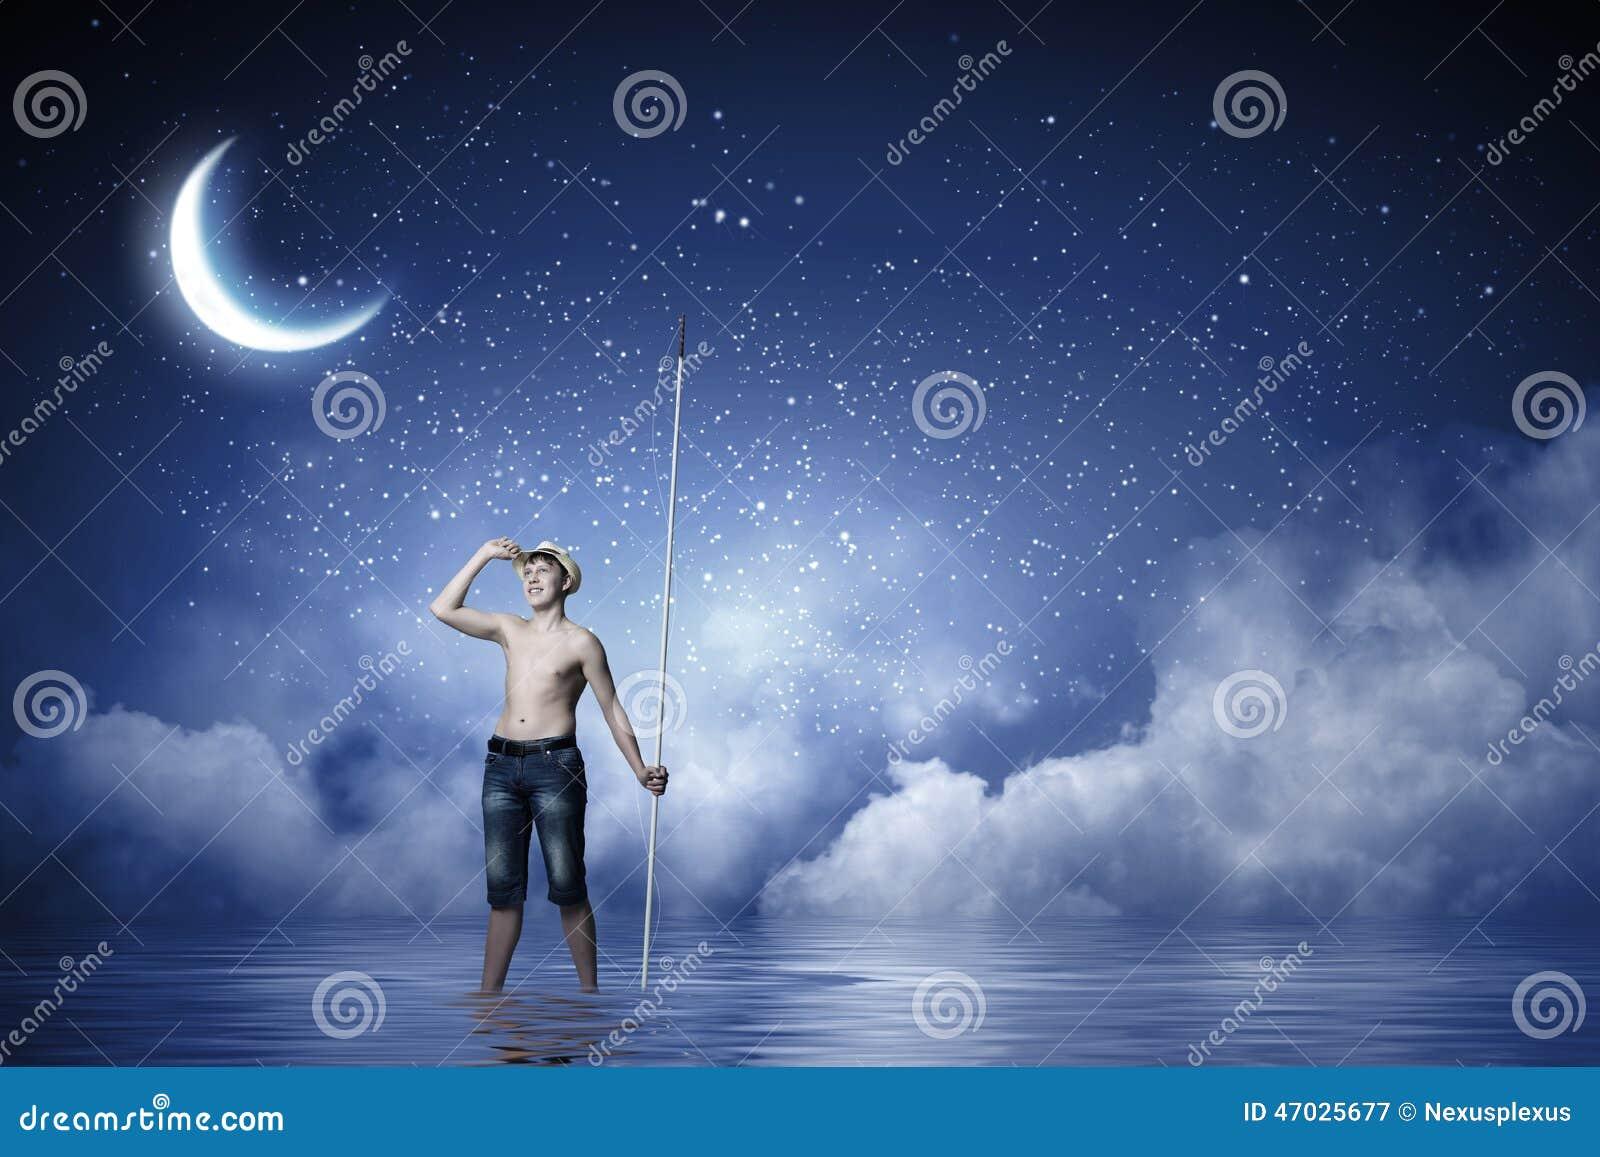 Kids at night with moon royalty free stock photography image - Royalty Free Stock Photo Boy Fisherman Fishing Kid Night